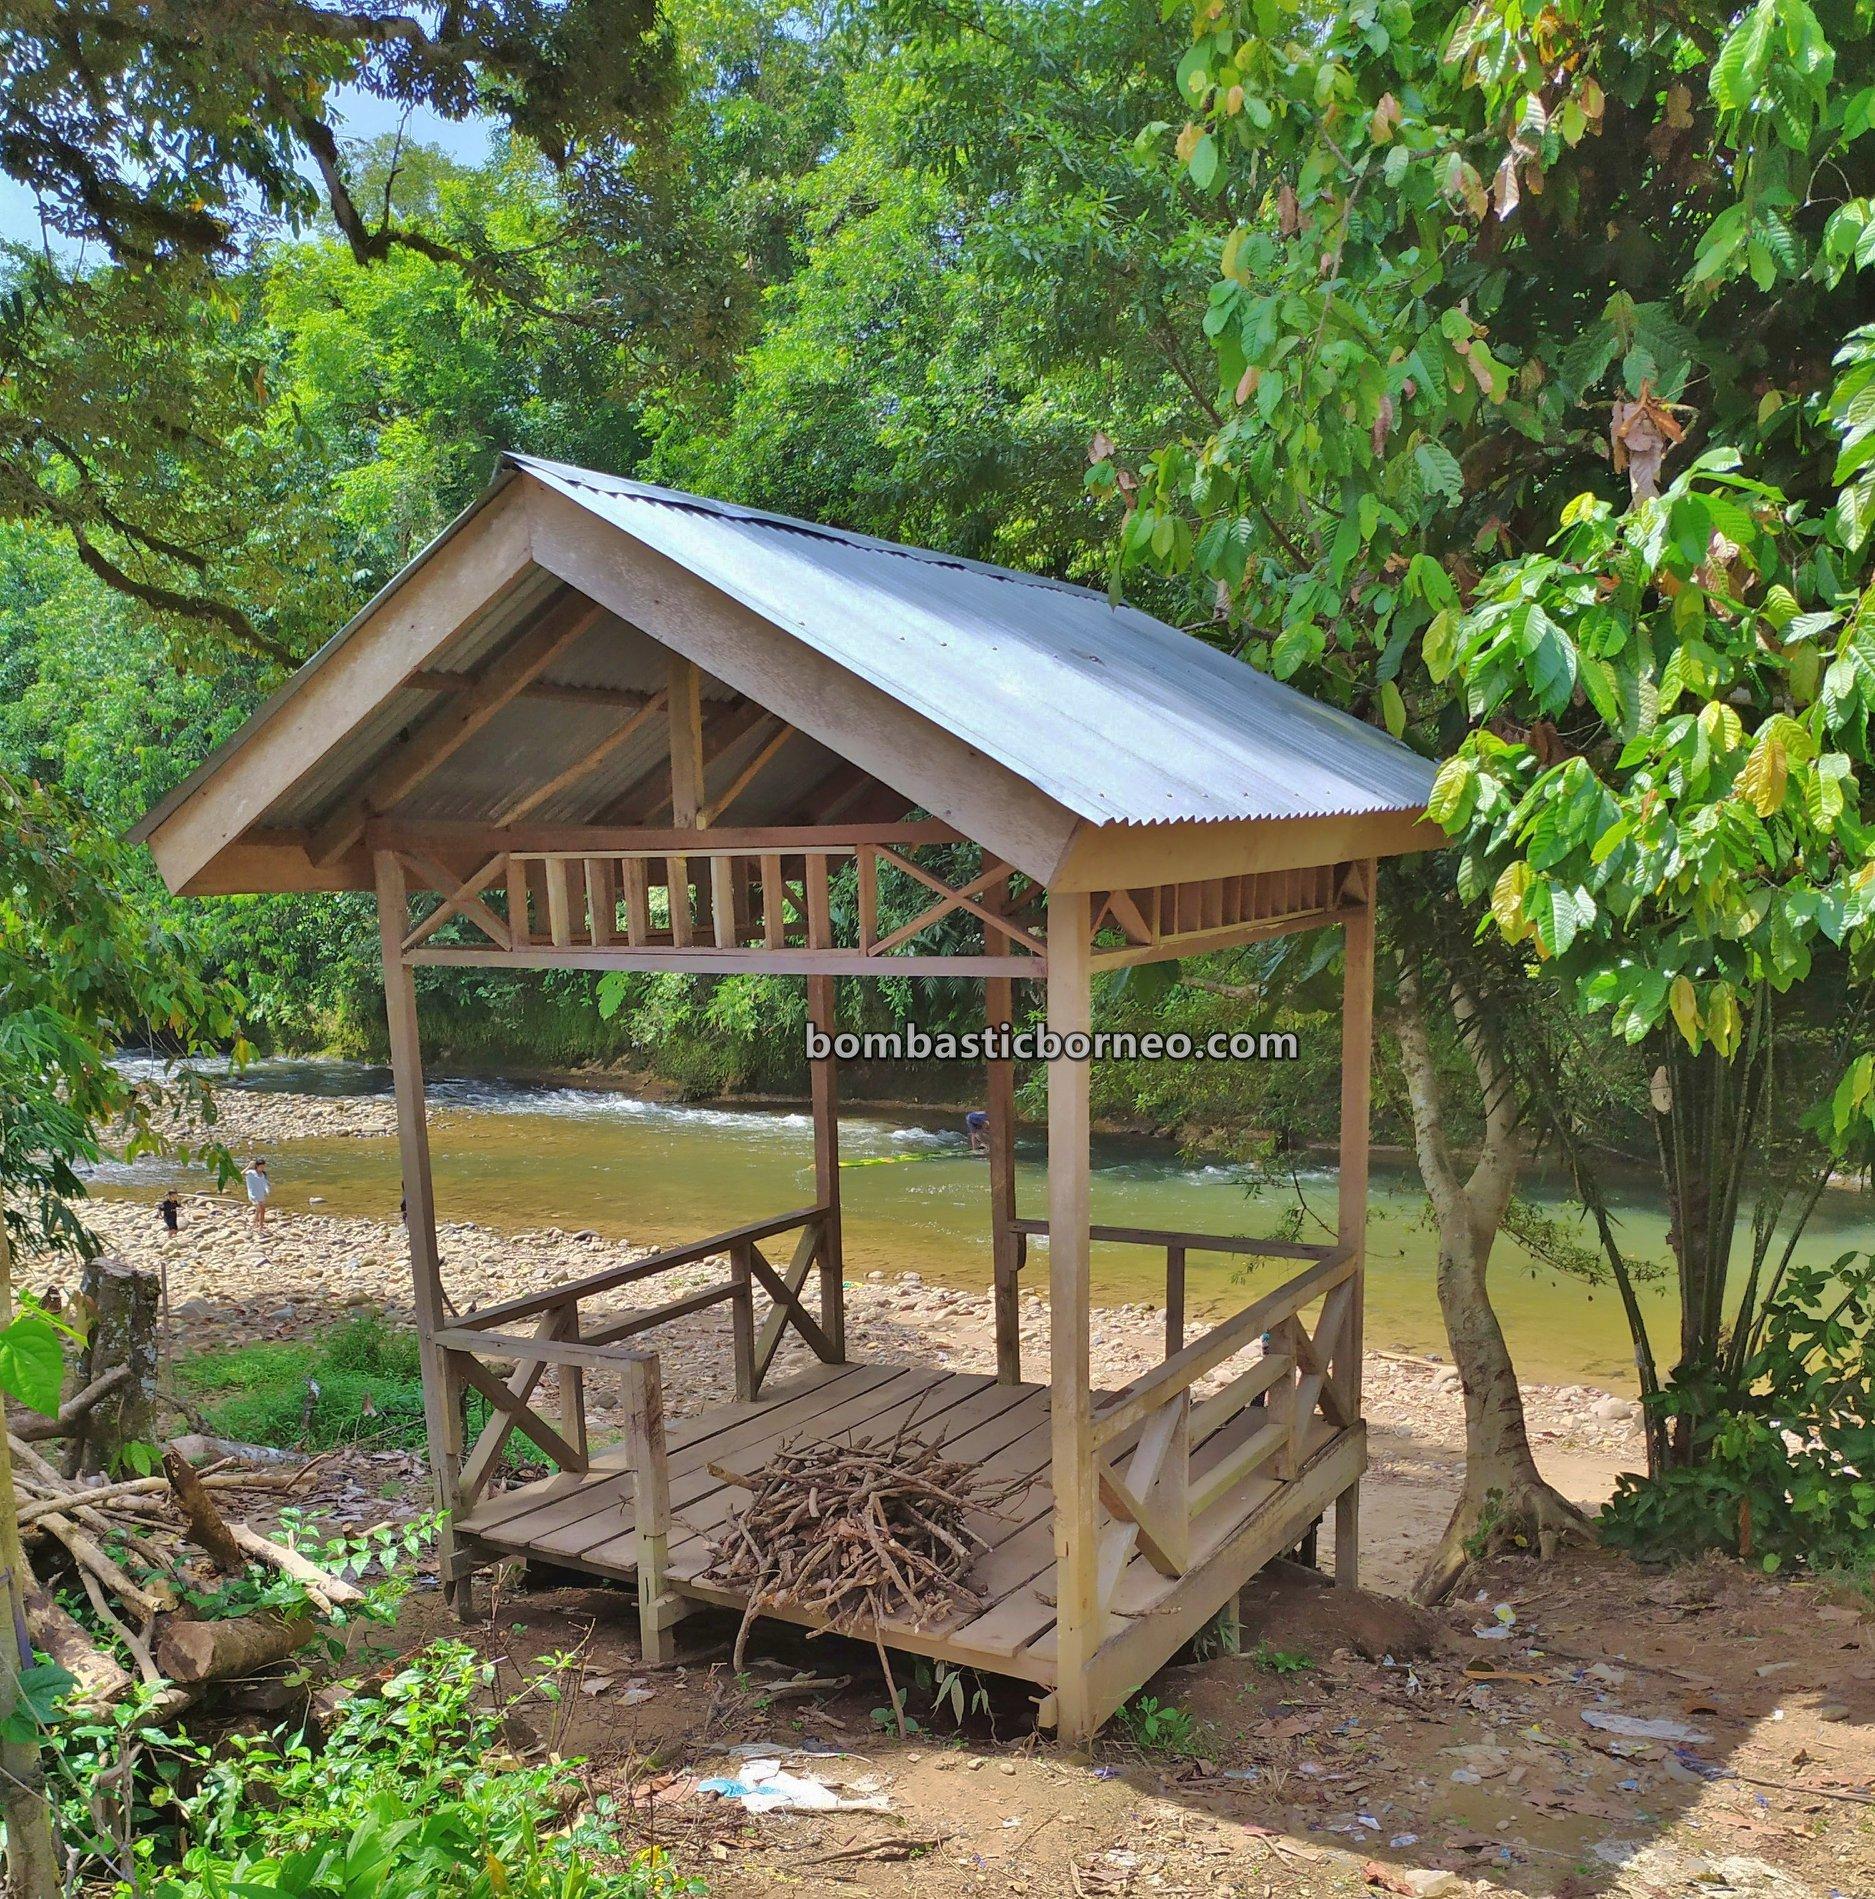 Sungkung Anep, Dusun Medeng, traditional, destination, Bengkayang, Dayak Bidayuh, tribe, highland, obyek wisata, Travel guide, Cross Border, Borneo, 穿越婆罗洲部落, 西加里曼丹原住民, 印尼比达友族